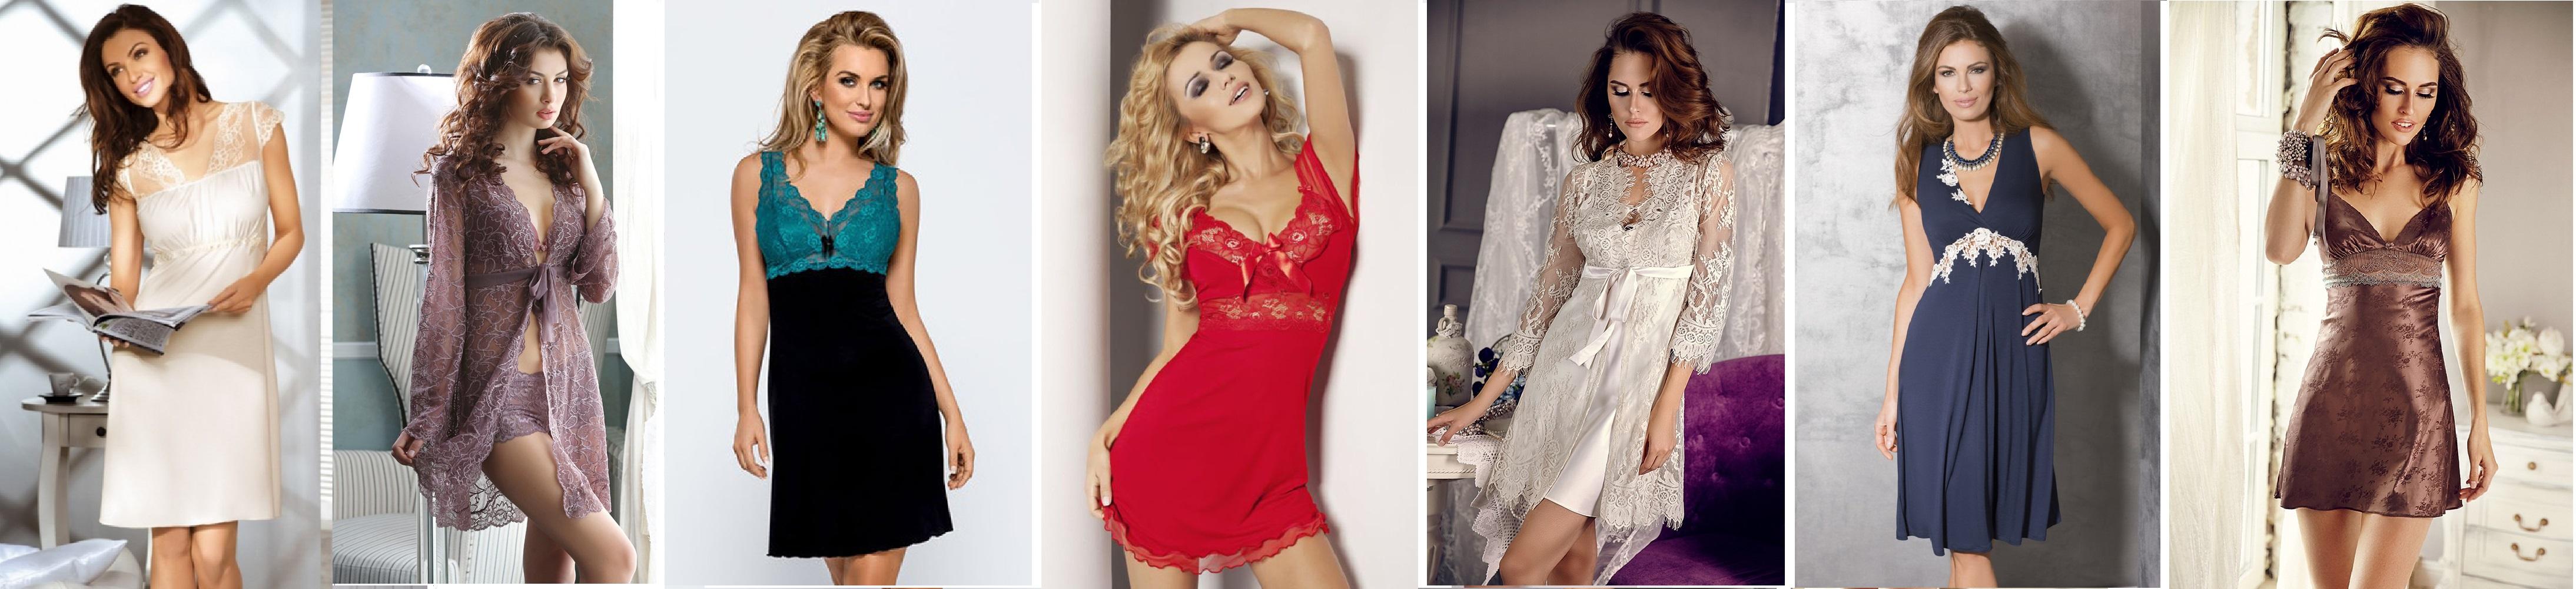 Женские сорочки, халаты шелк вискоза купить интернет-магазин Киев